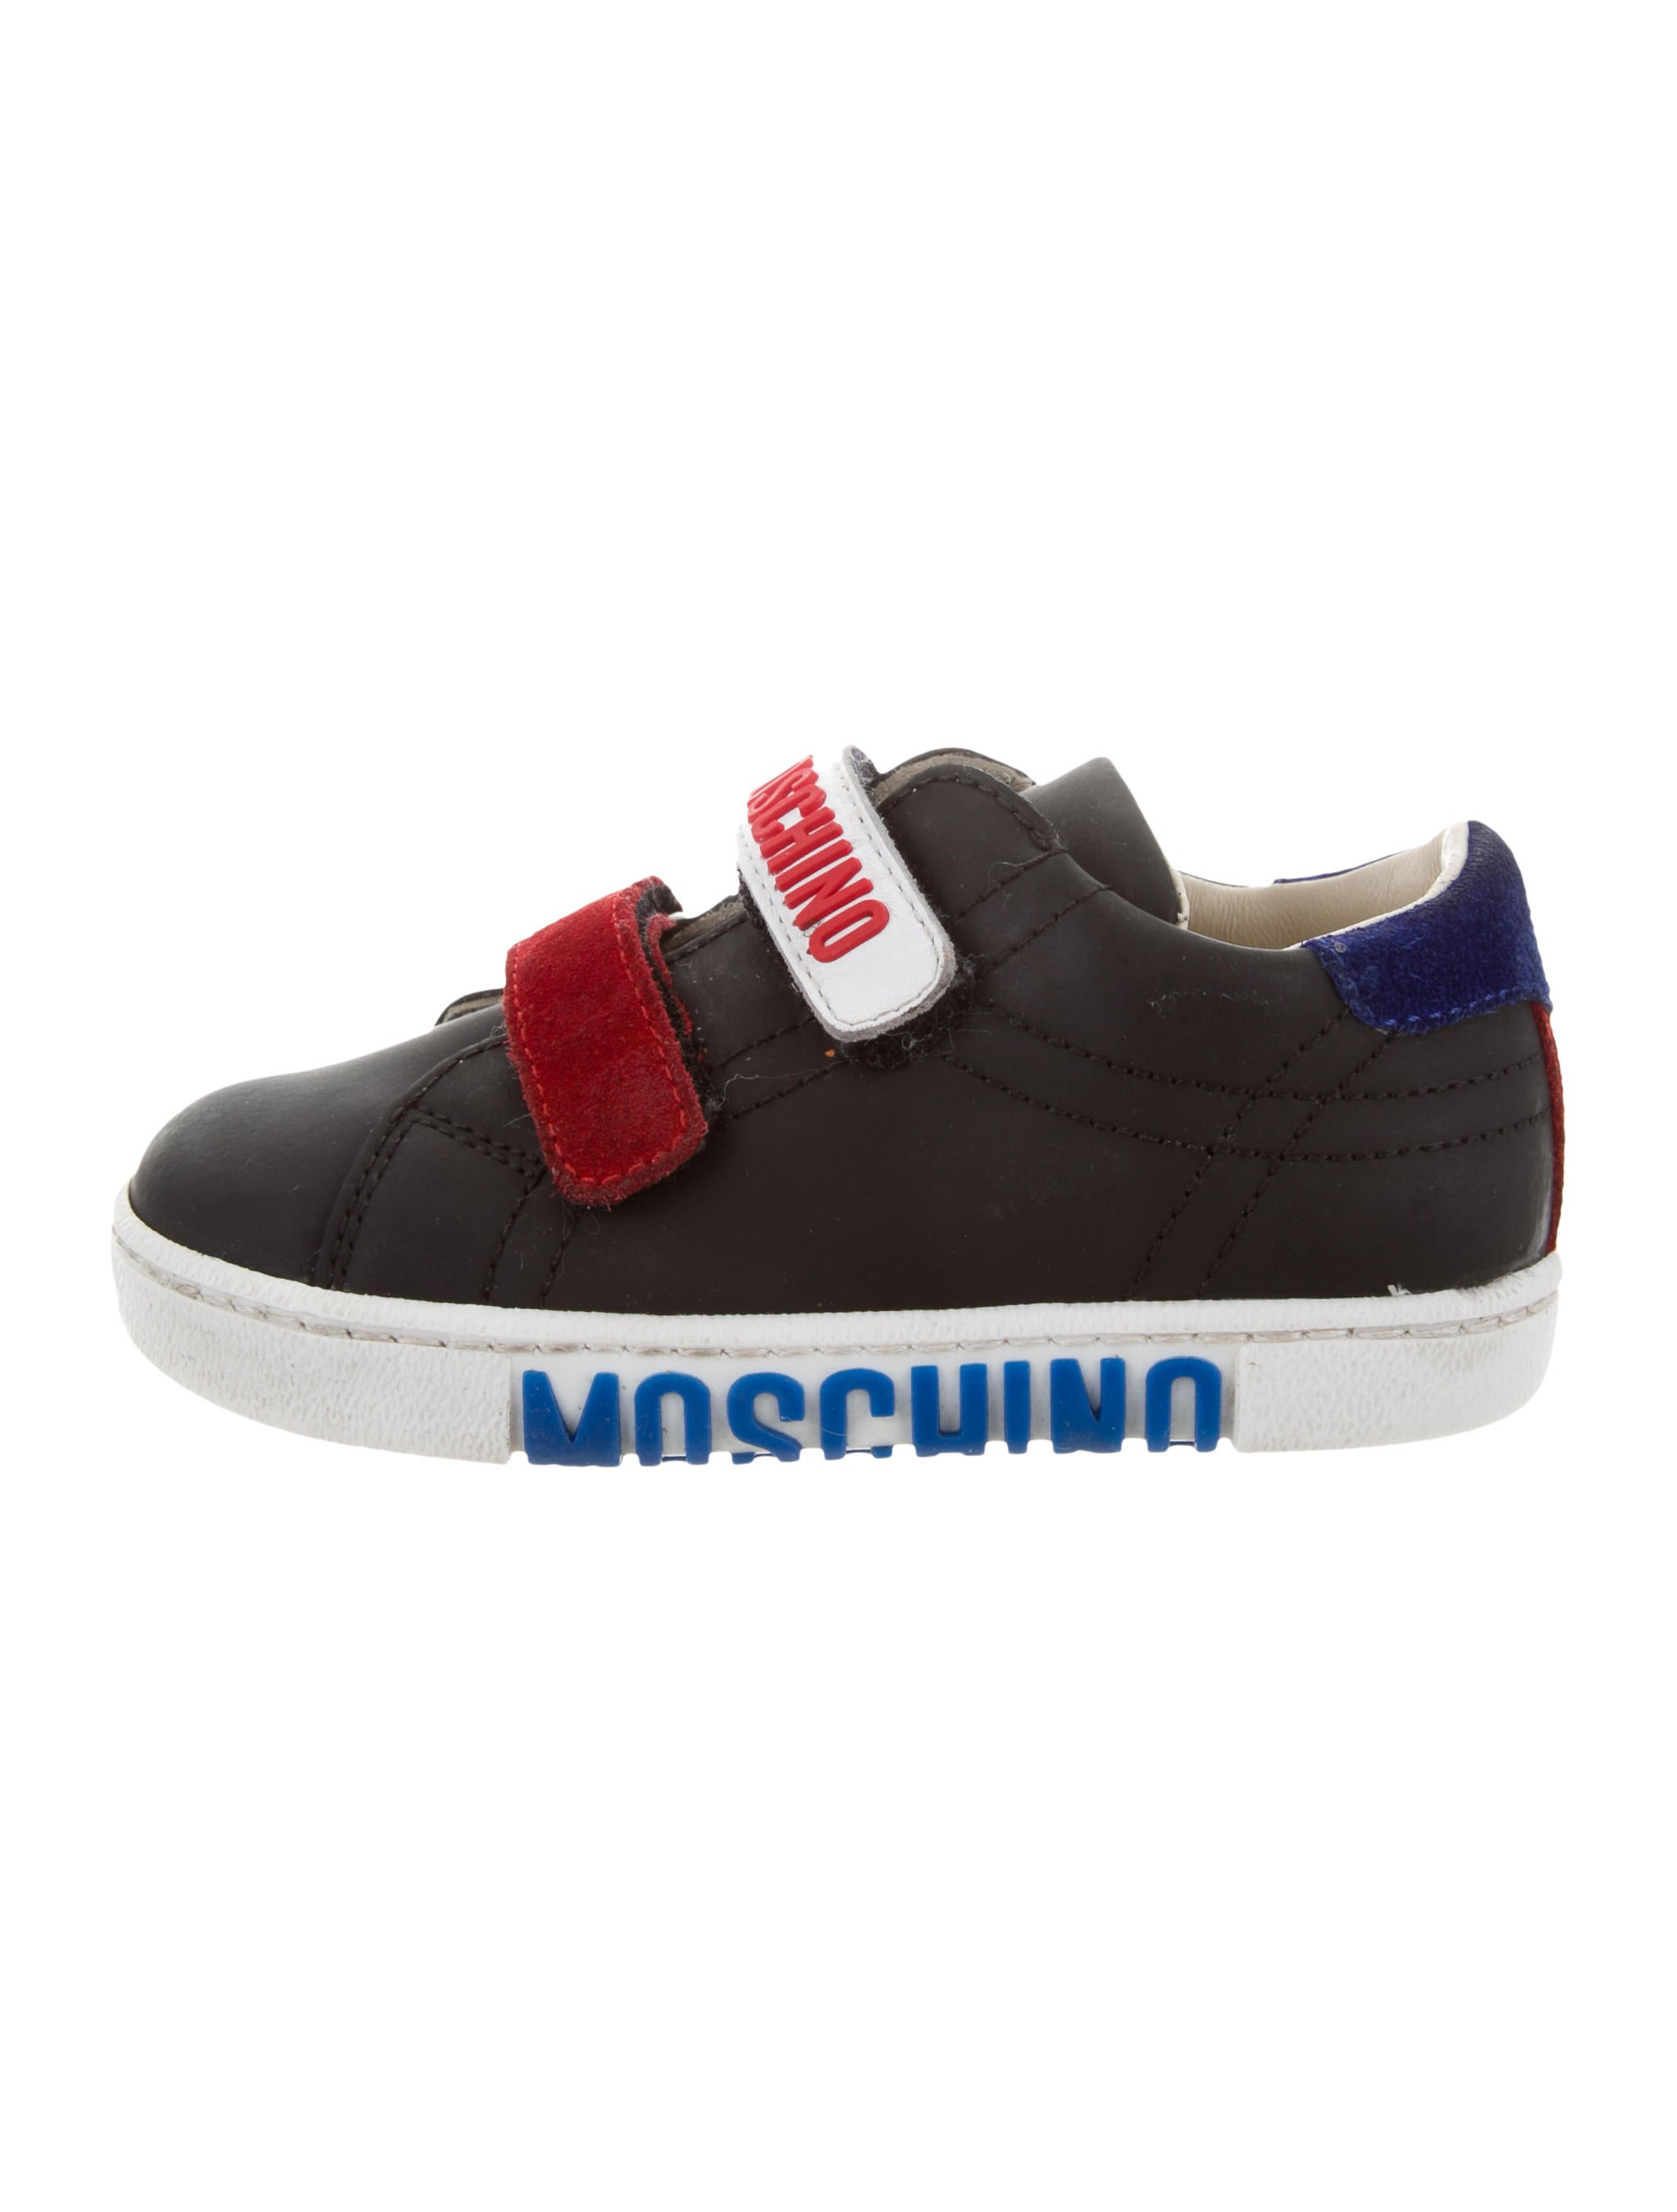 Mos Bas-tops Et Chaussures De Sport IHgNInSUi